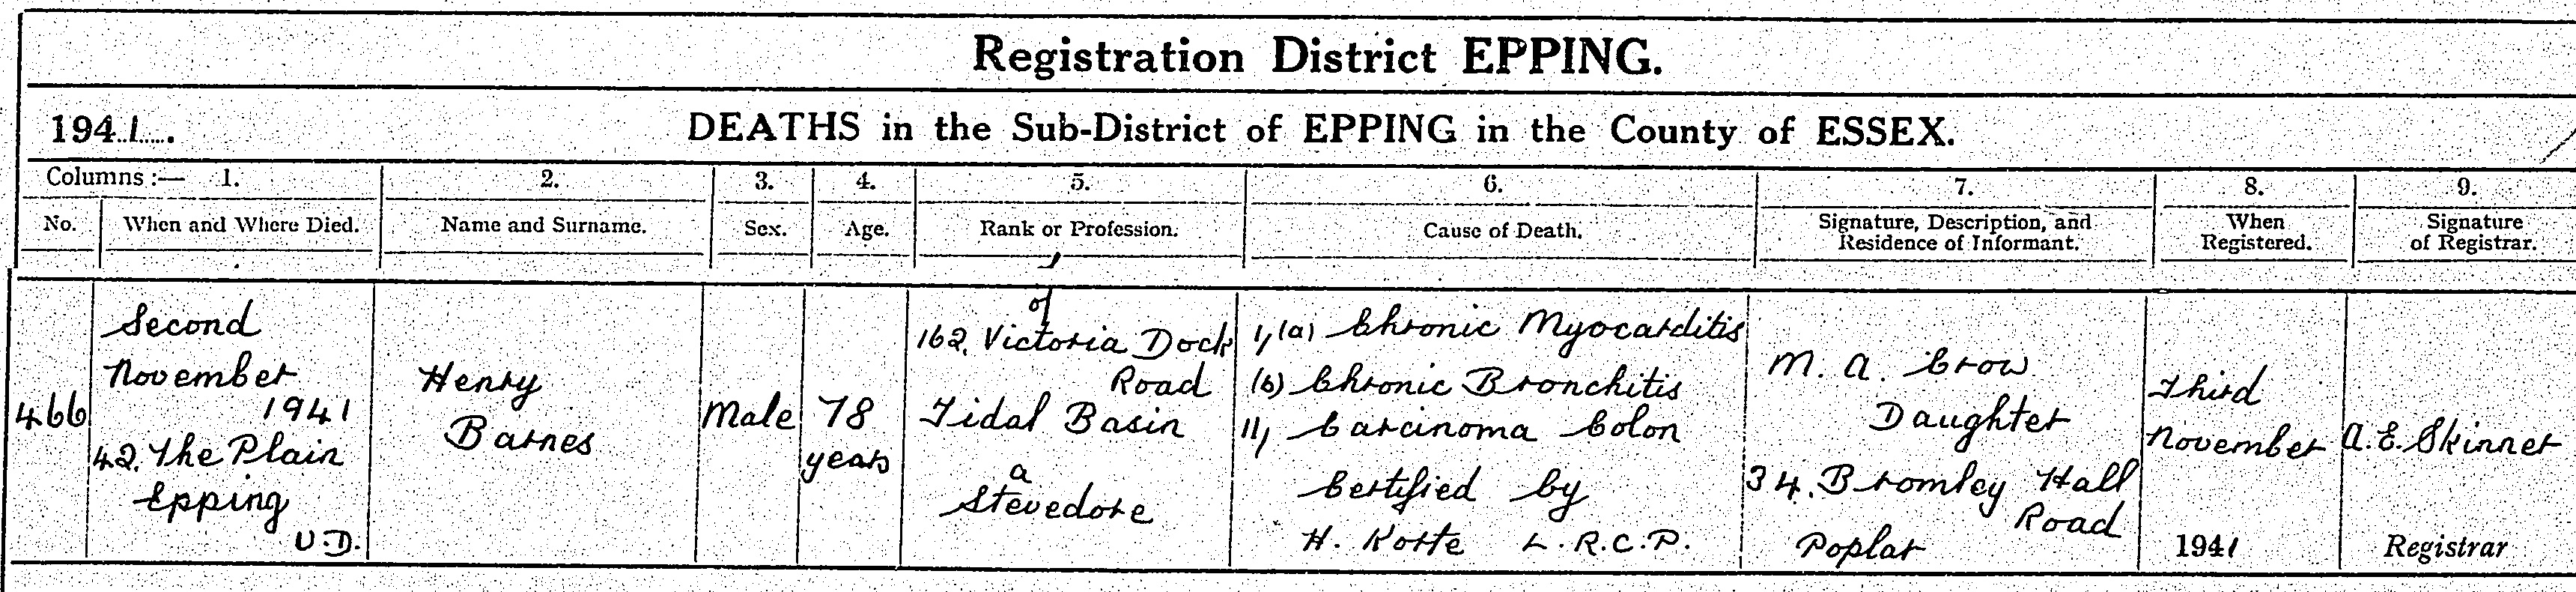 Henry Barnes Death Certificate